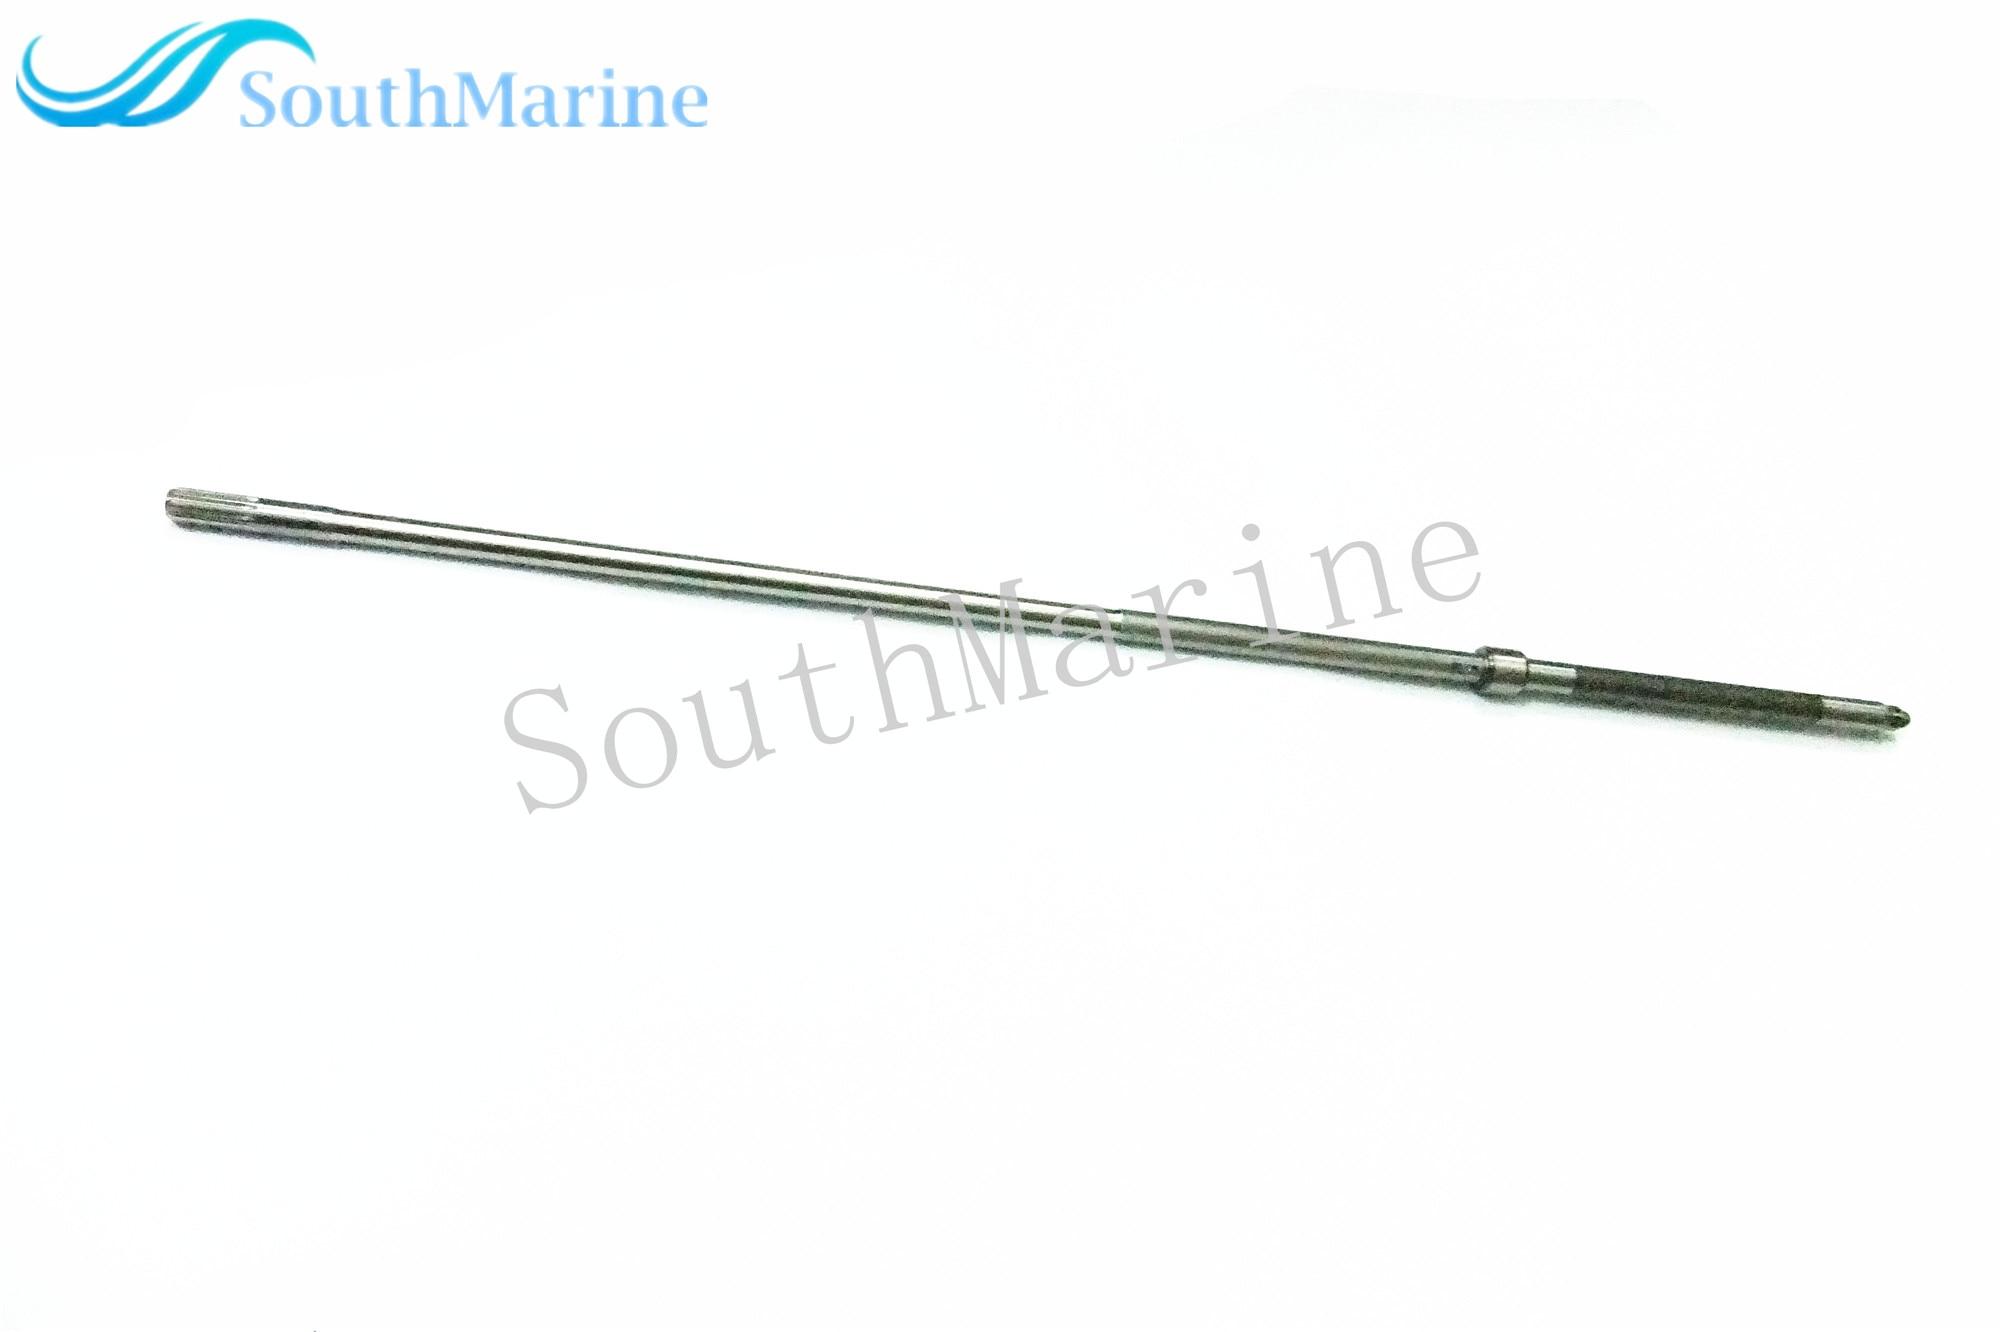 63v 11 Long Drive Shaft For Outboard Engine Yamaha 4